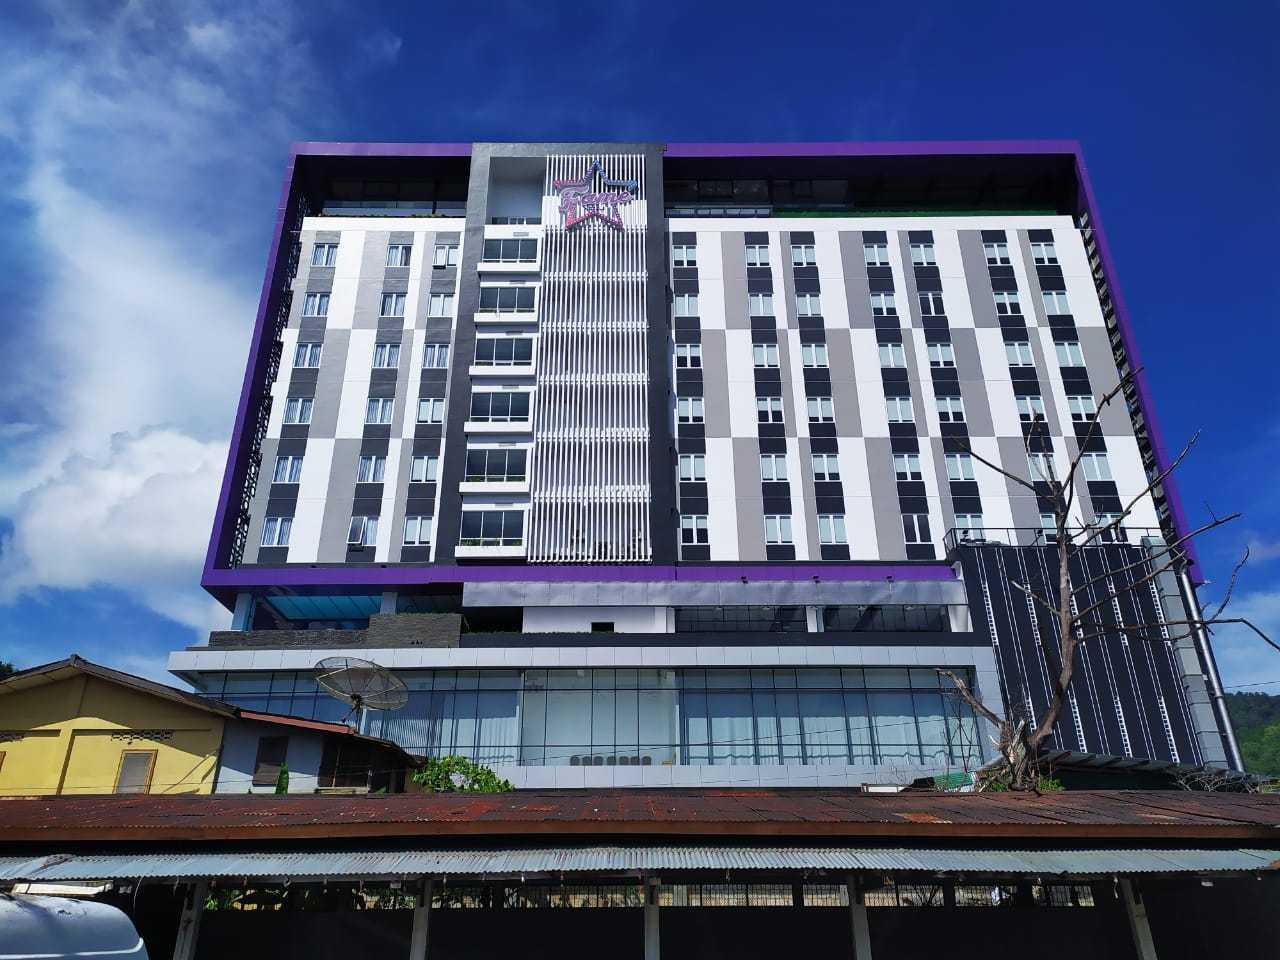 Pt.  Atelier Una Indonesia Fox (Fame) Hotel Jayapura Jayapura, Kota Jayapura, Papua, Indonesia Jayapura, Kota Jayapura, Papua, Indonesia Pt-Atelier-Una-Indonesia-Fame-Hotel-Jayapura   82424